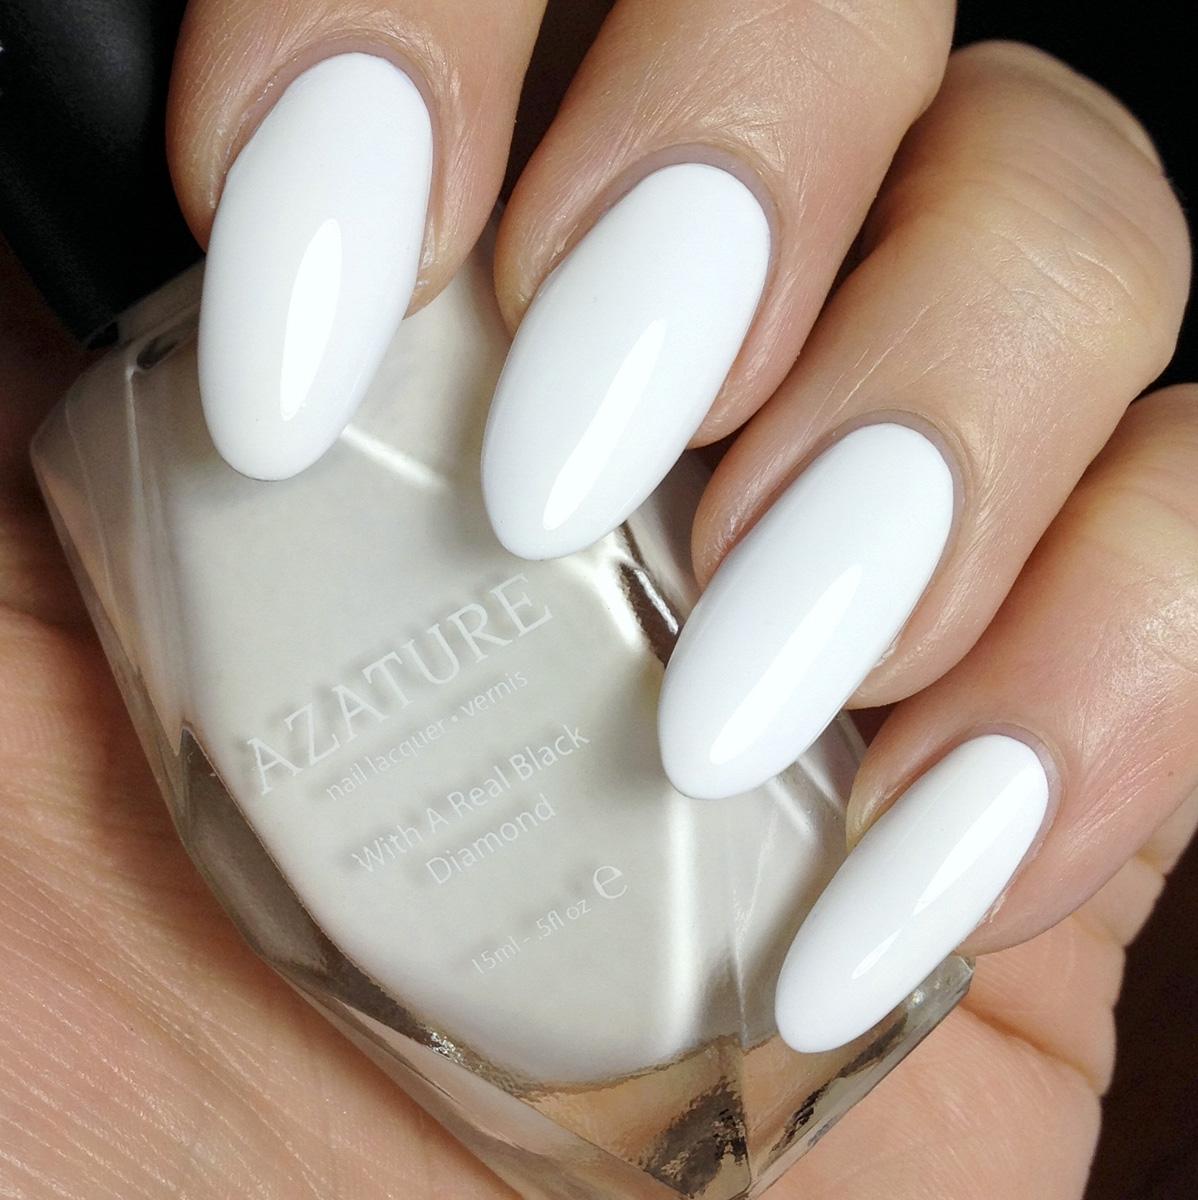 Image - Azature - Faint White Diamond - Nail lacquer.jpg | Gagapedia ...